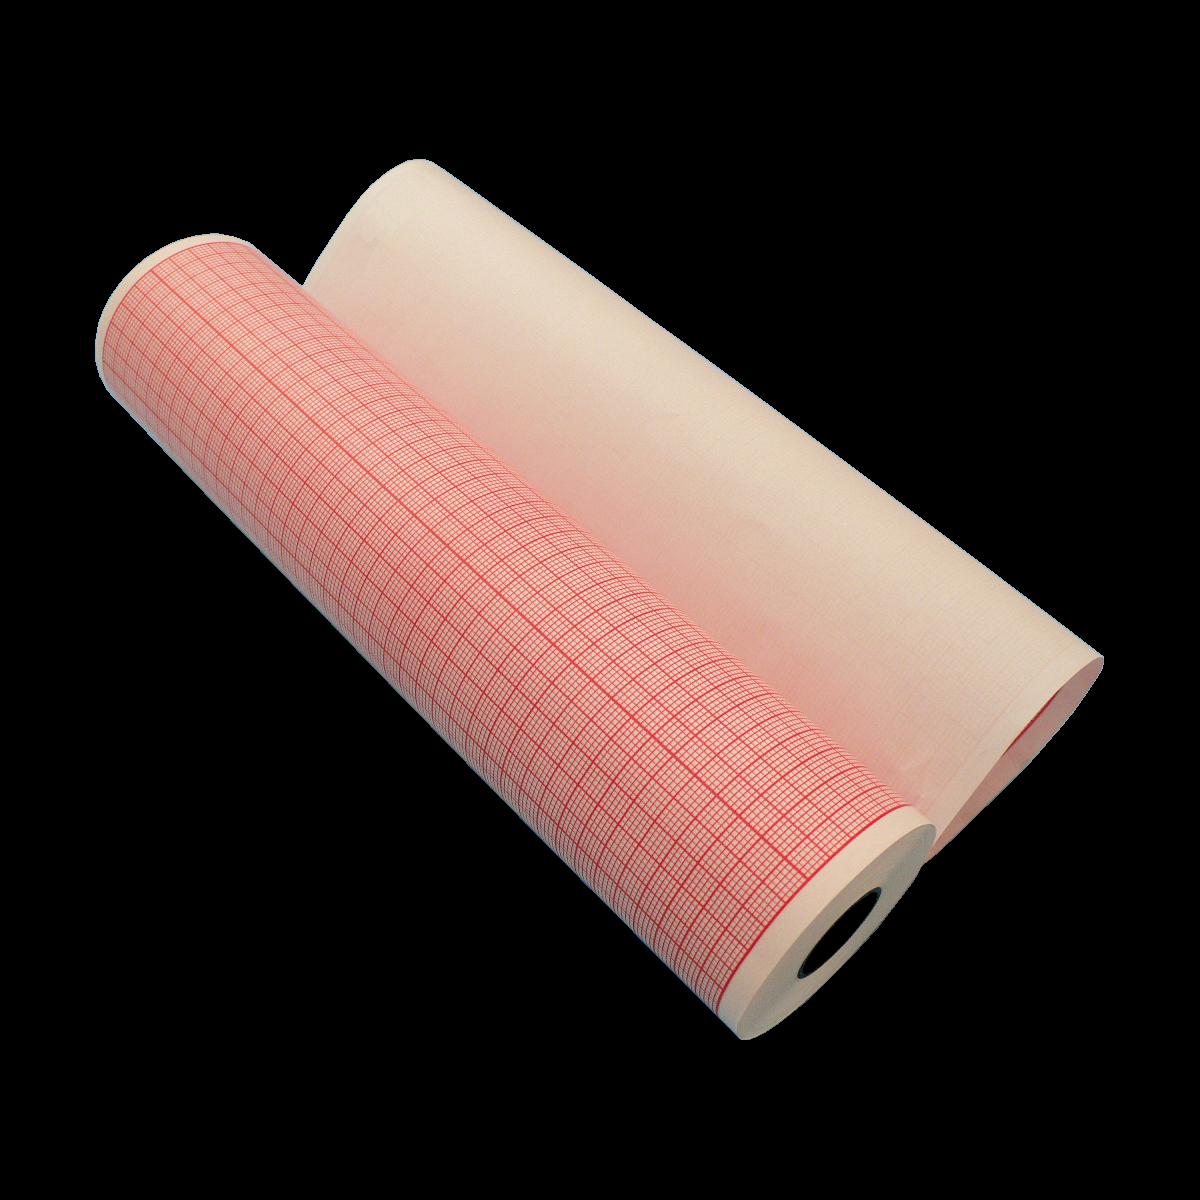 183х30х18, бумага ЭКГ для Kenz Cardico 1207, Siemens, реестр 4061/1